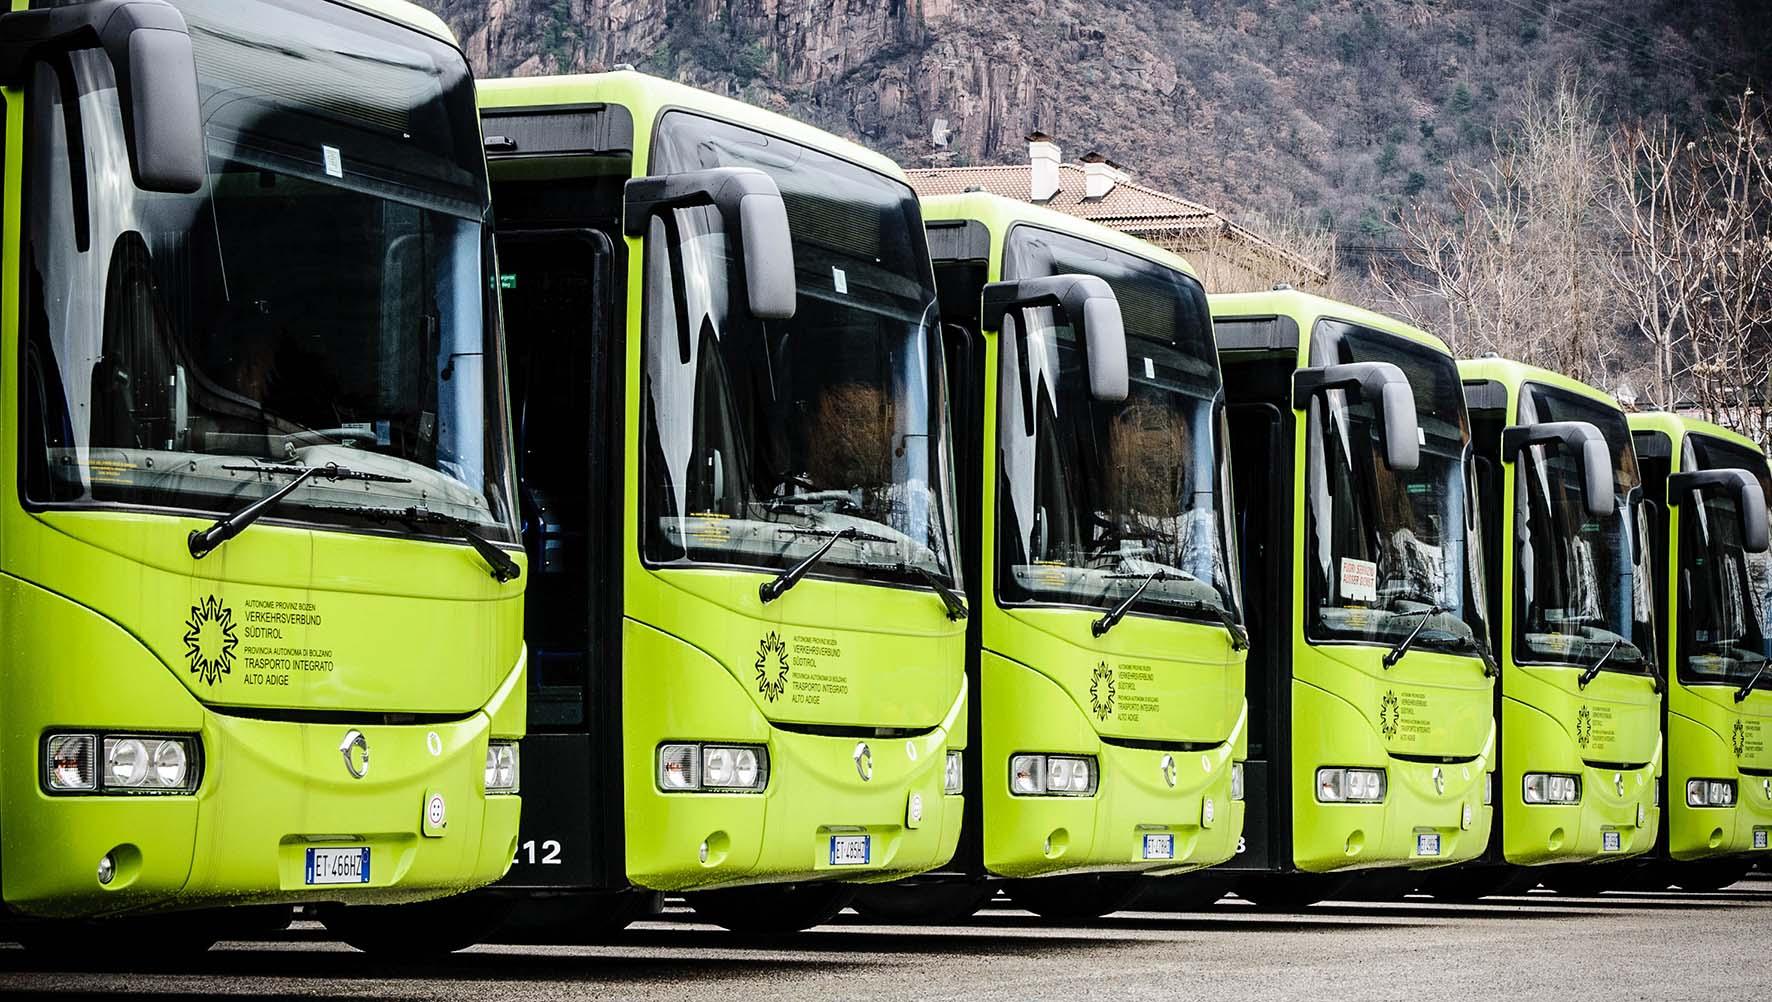 mezzi pubblici Sad nuova flotta autobus extraurbano alto adige